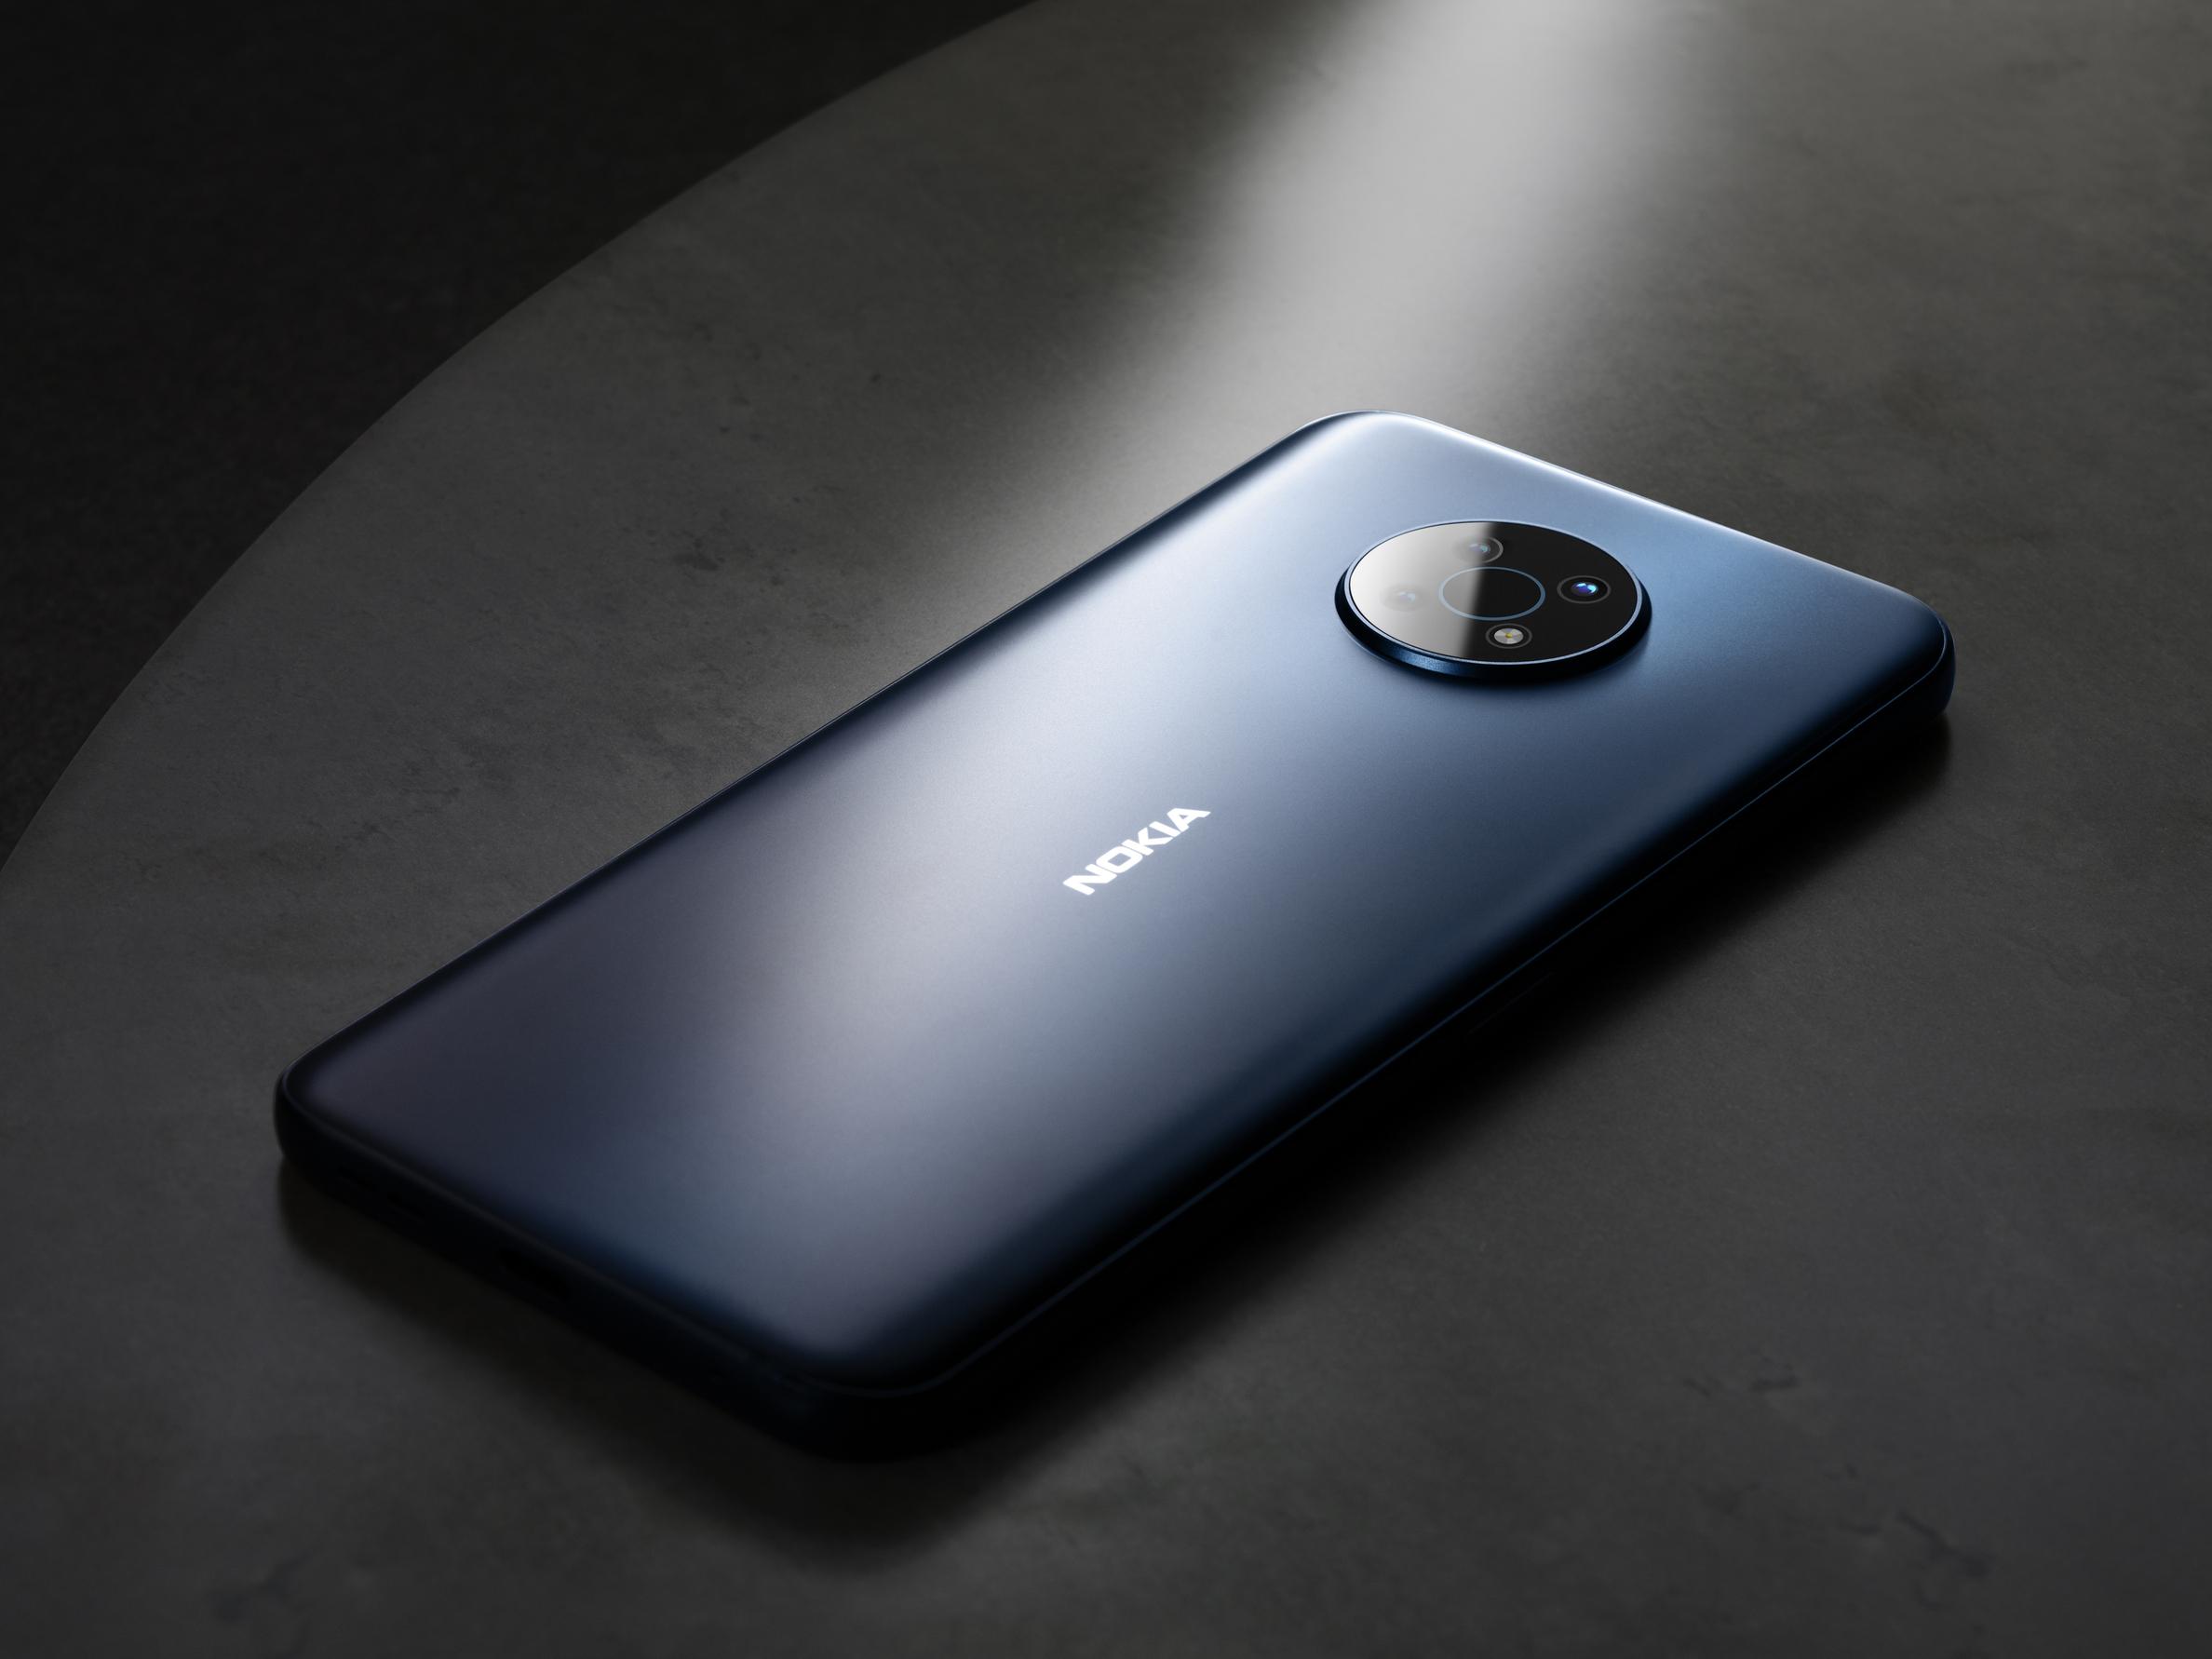 HMD Global เปิดตัว Nokia G50 สมาร์ทโฟน 5G ใหม่